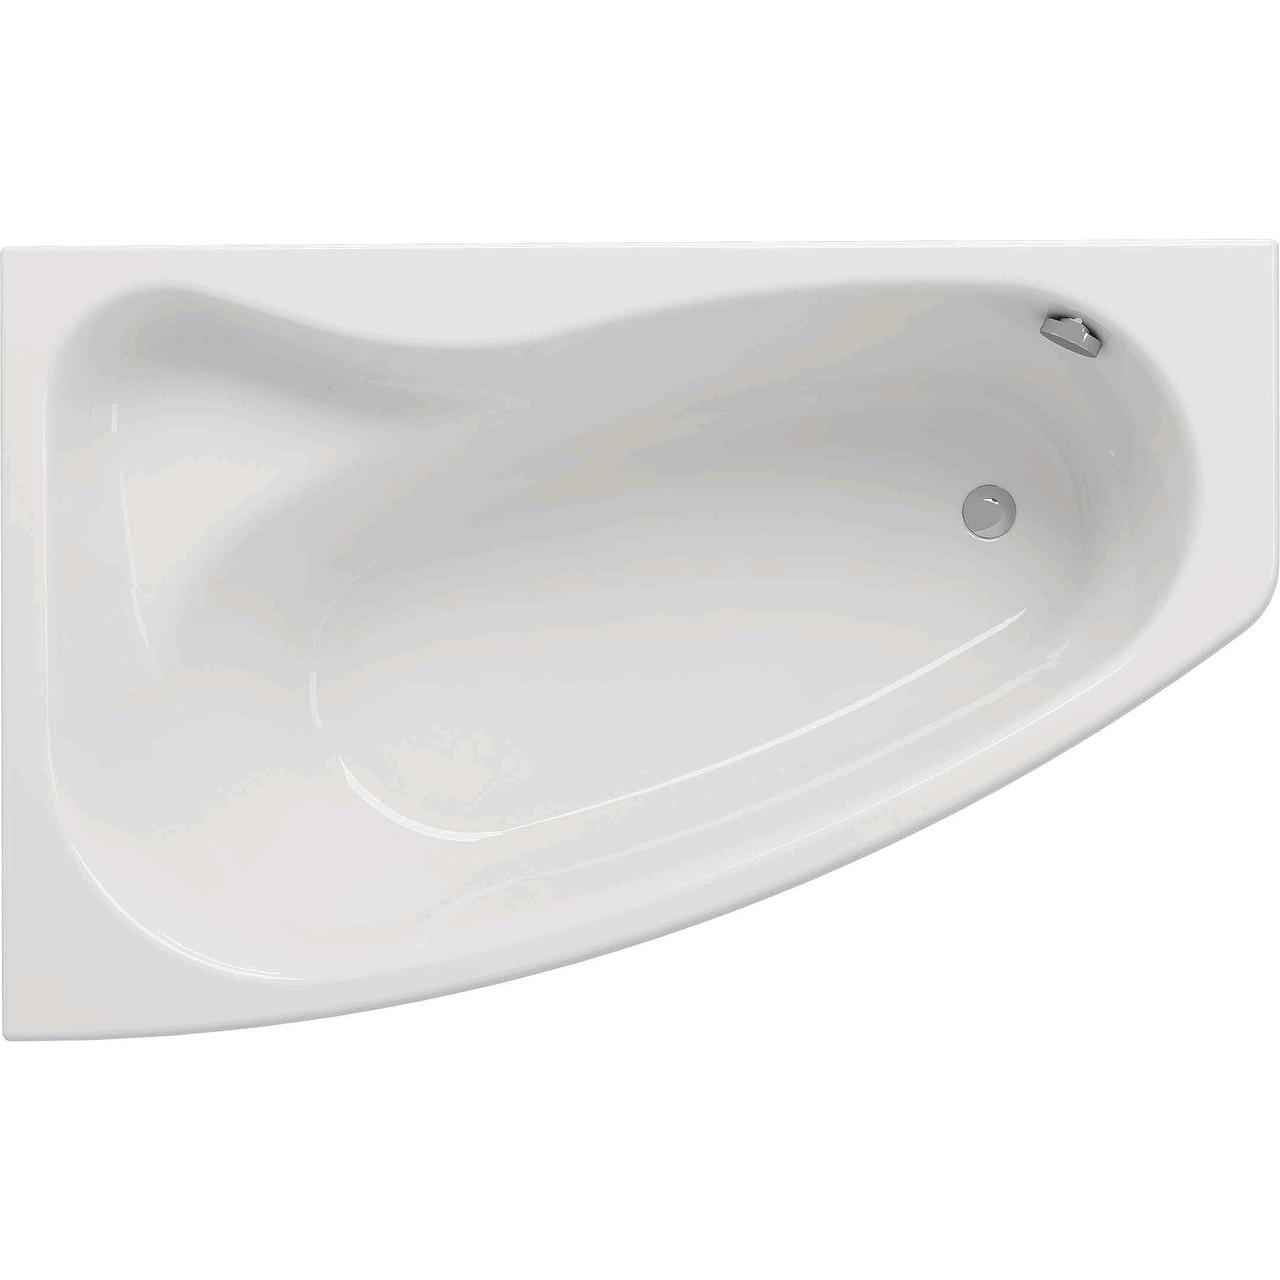 Ванна Sicilia new 170x100 (левая) Cersanit AZBA1000913342